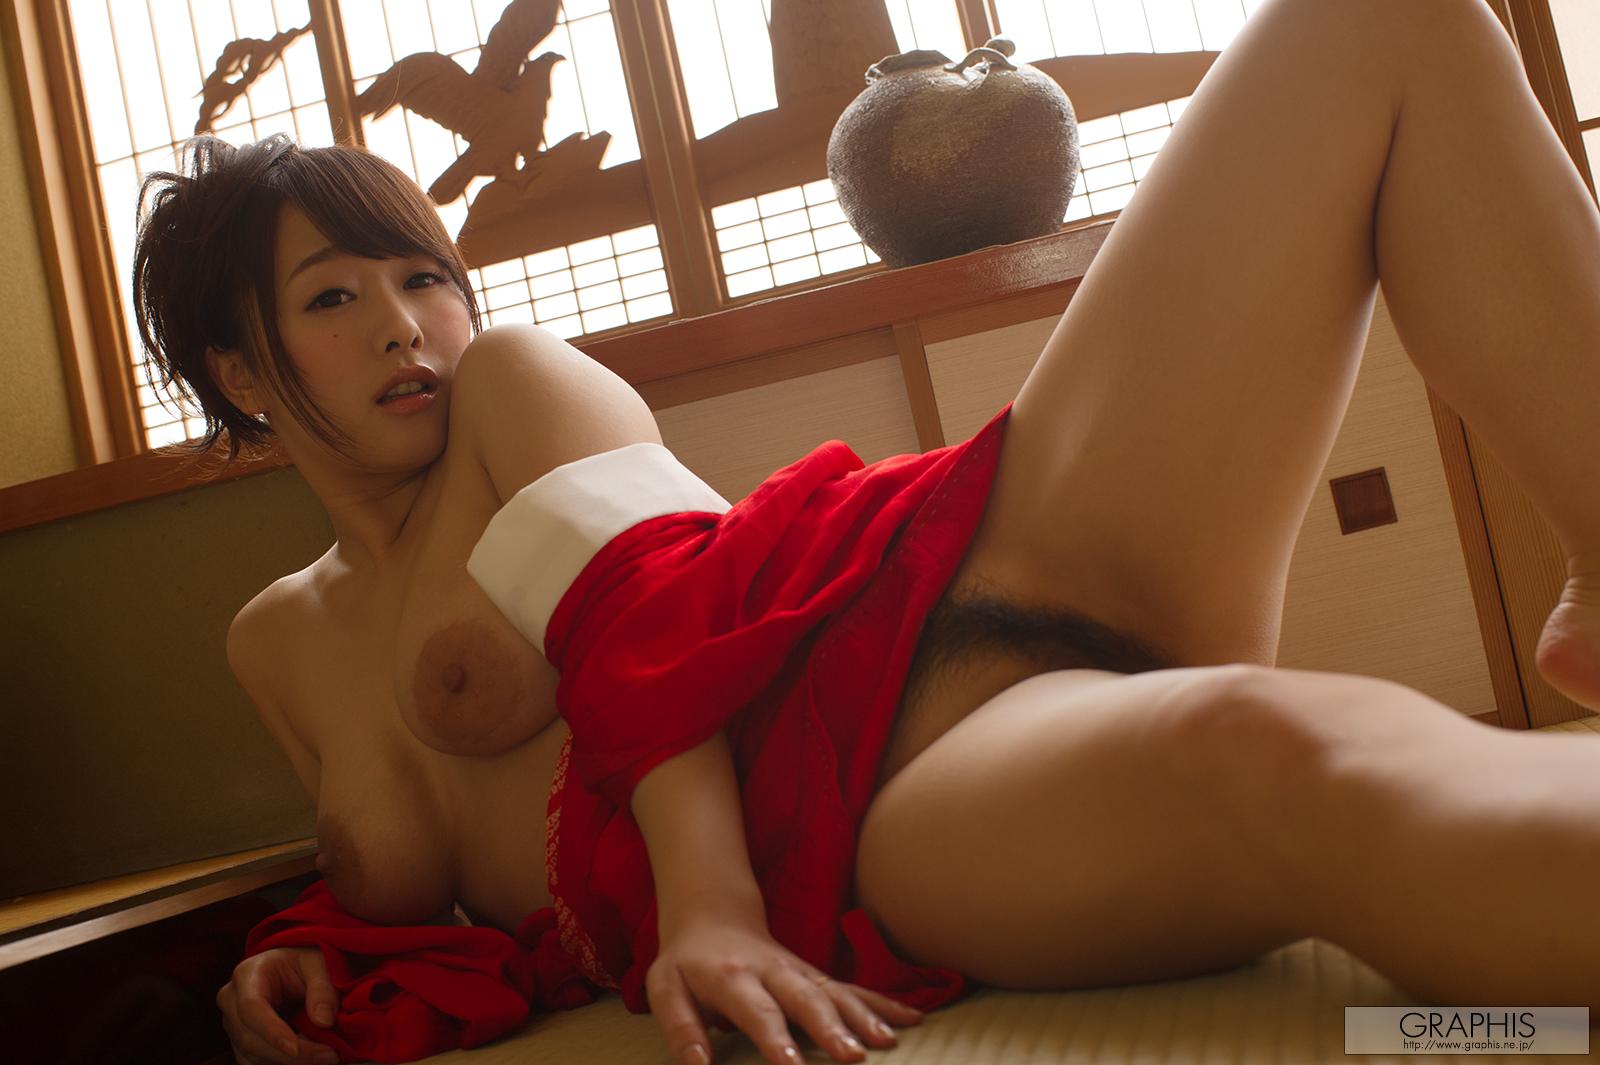 marina-shiraishi-red-kimono-boobs-naked-asian-graphis-13